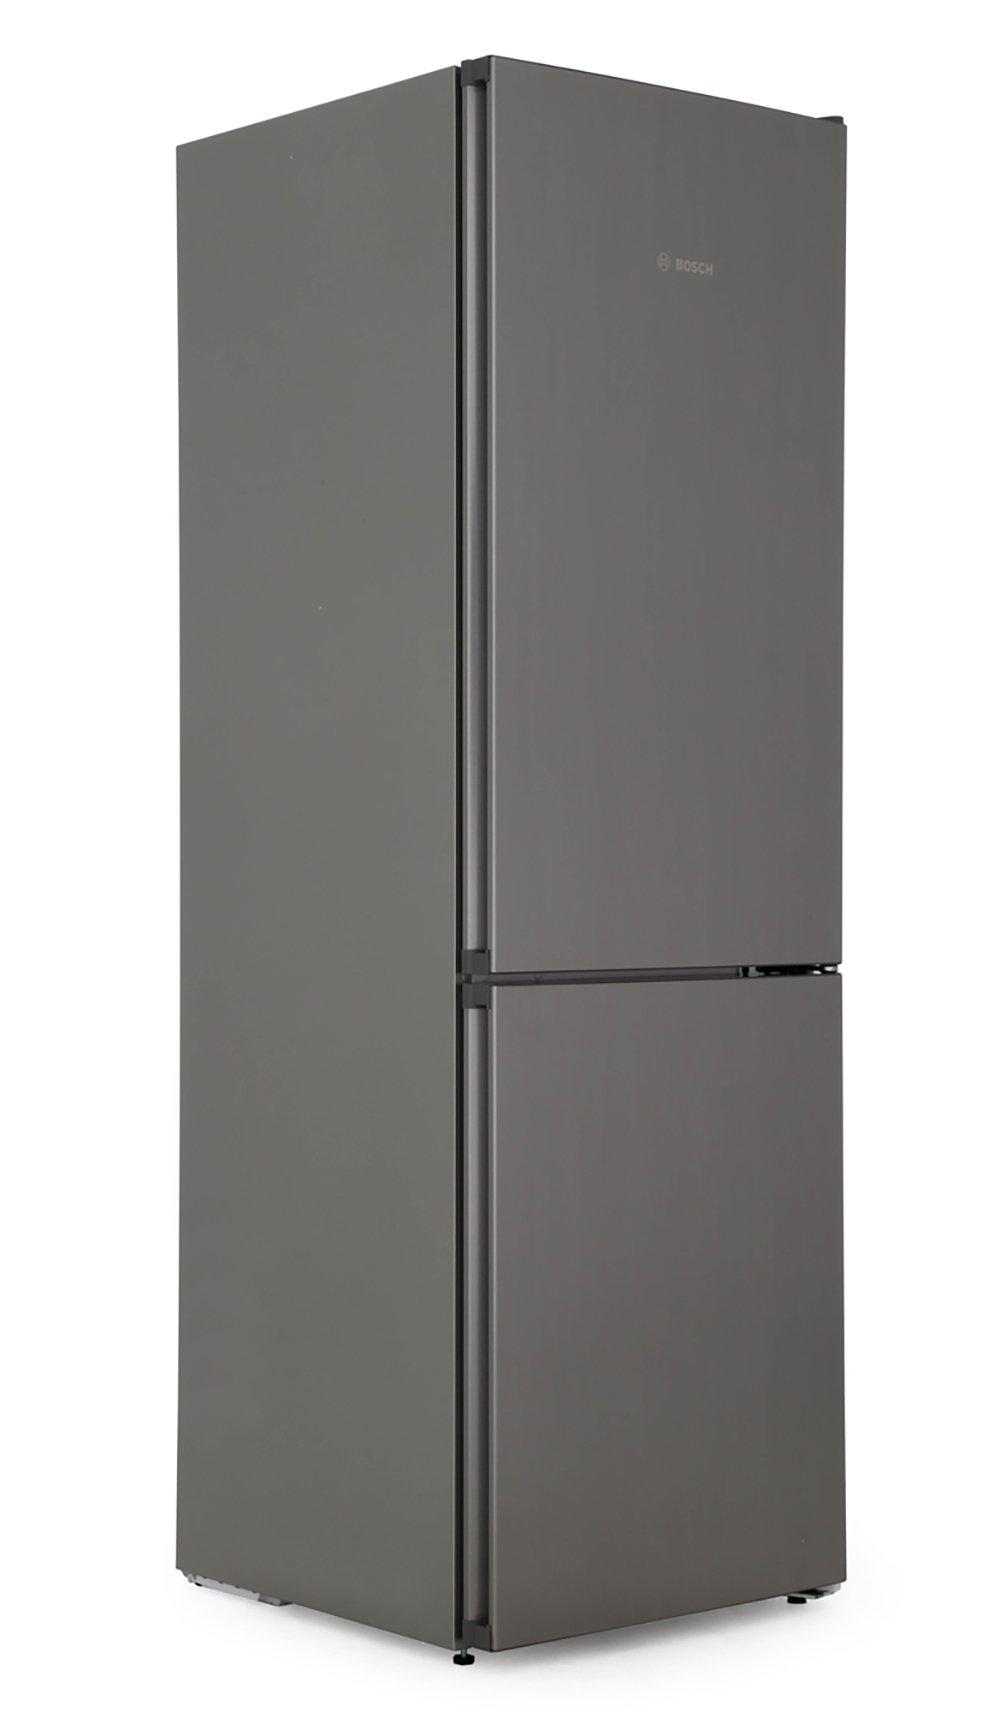 Bosch Serie 4 KGN36VL35G Frost Free Fridge Freezer